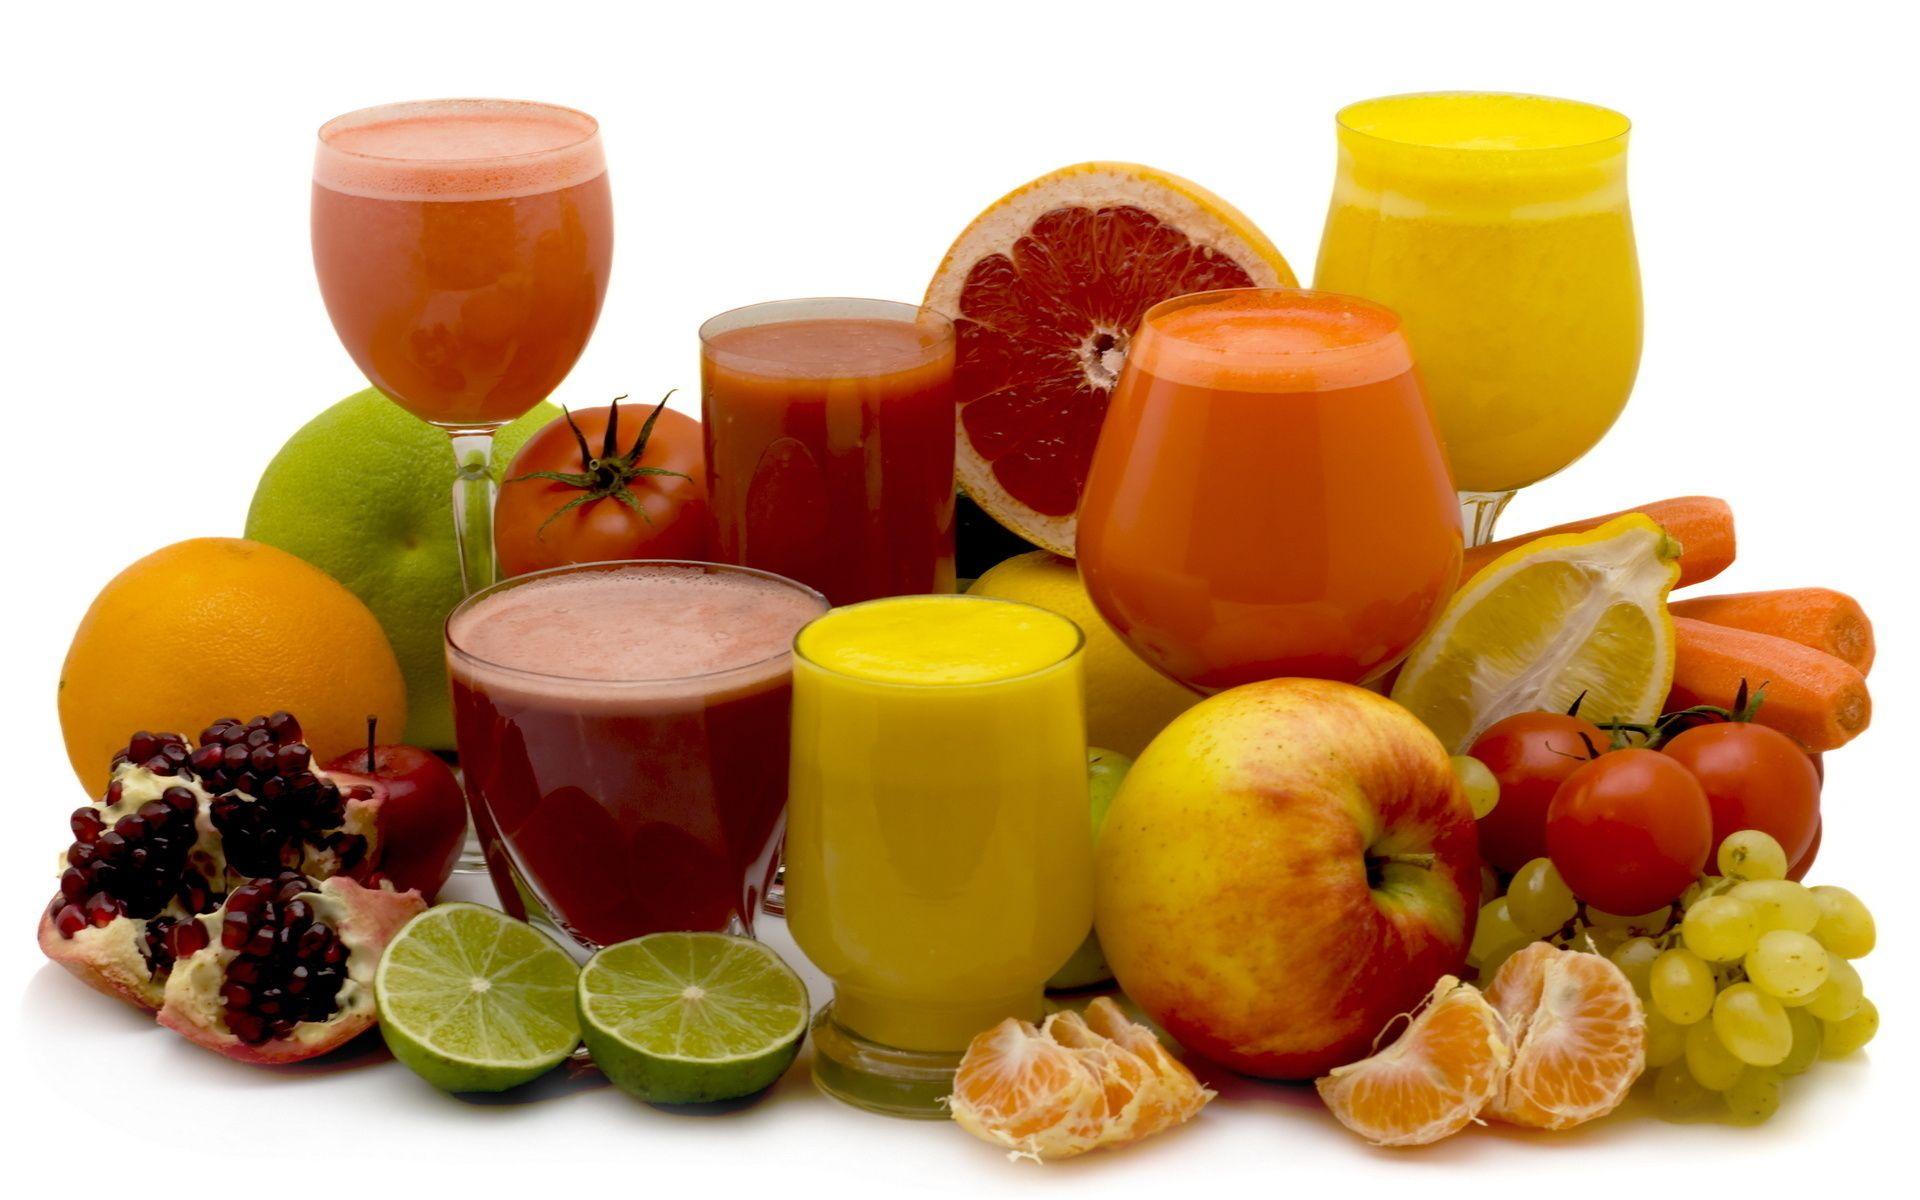 juice, juice recipes, juice for health, healthy body, juice per day